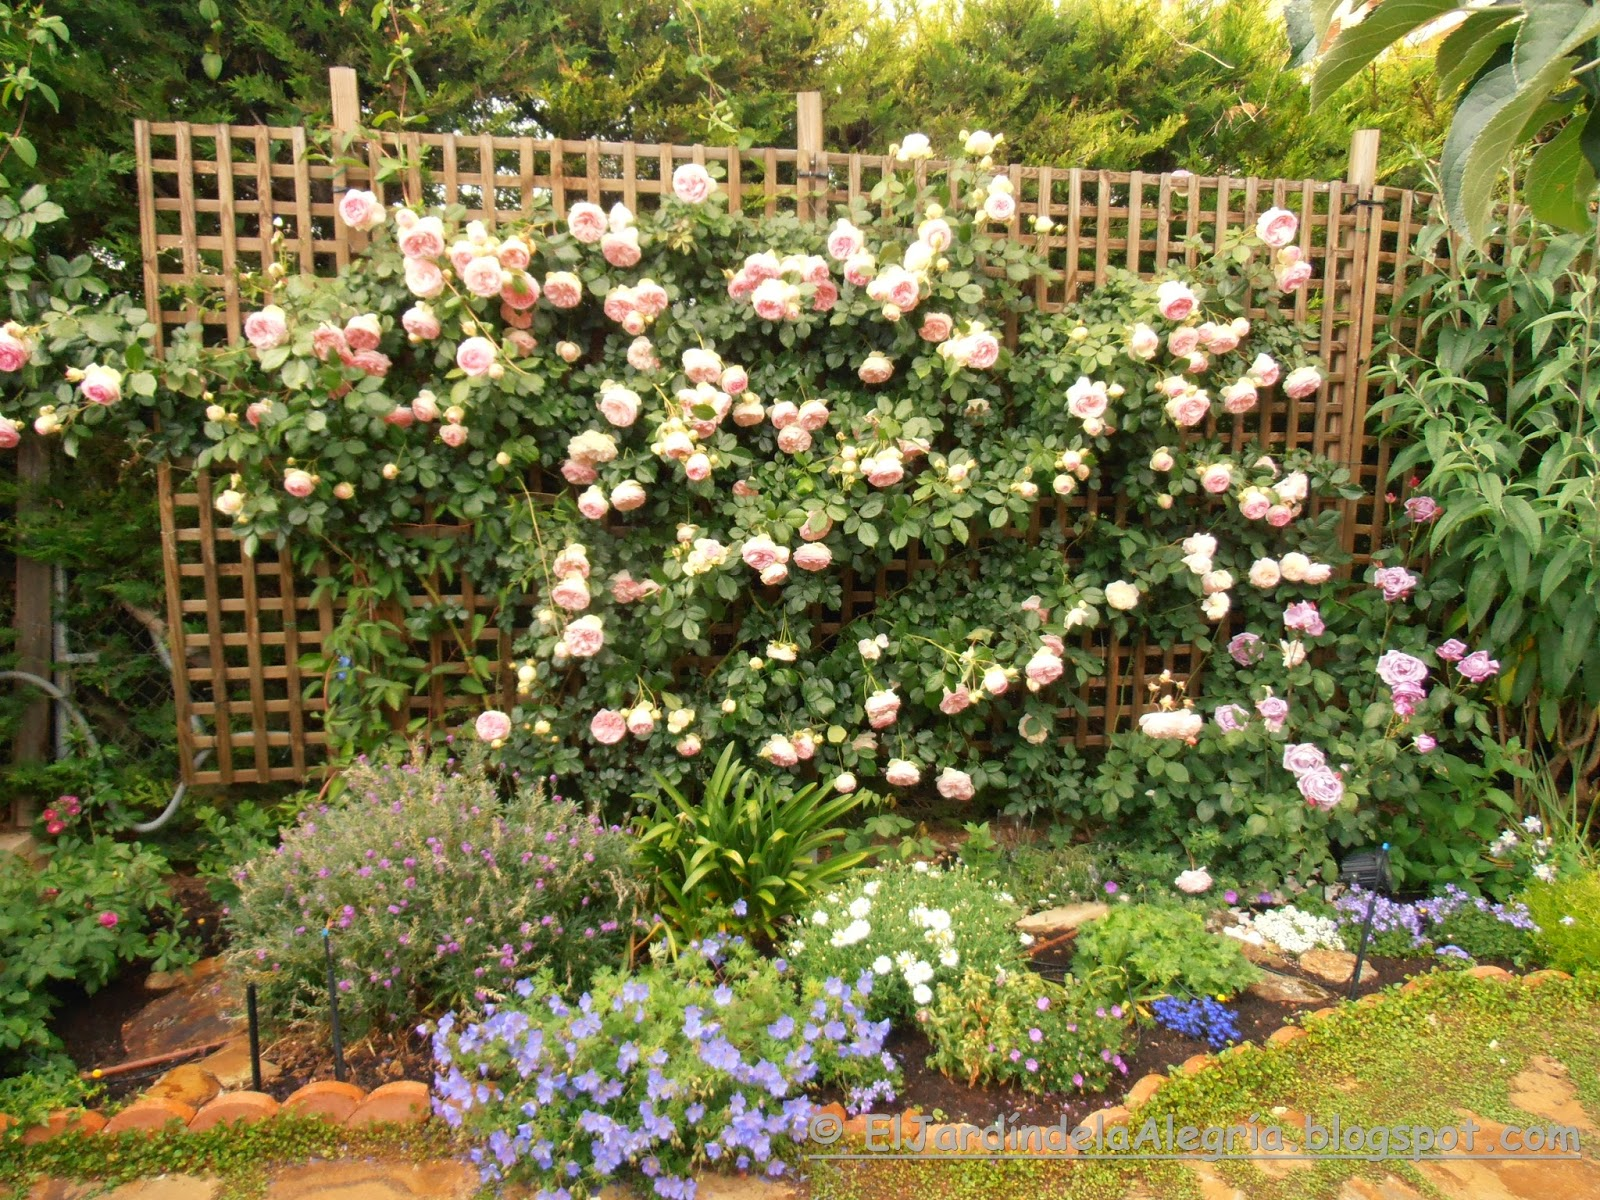 el jard n de la alegr a c mo se podan los rosales